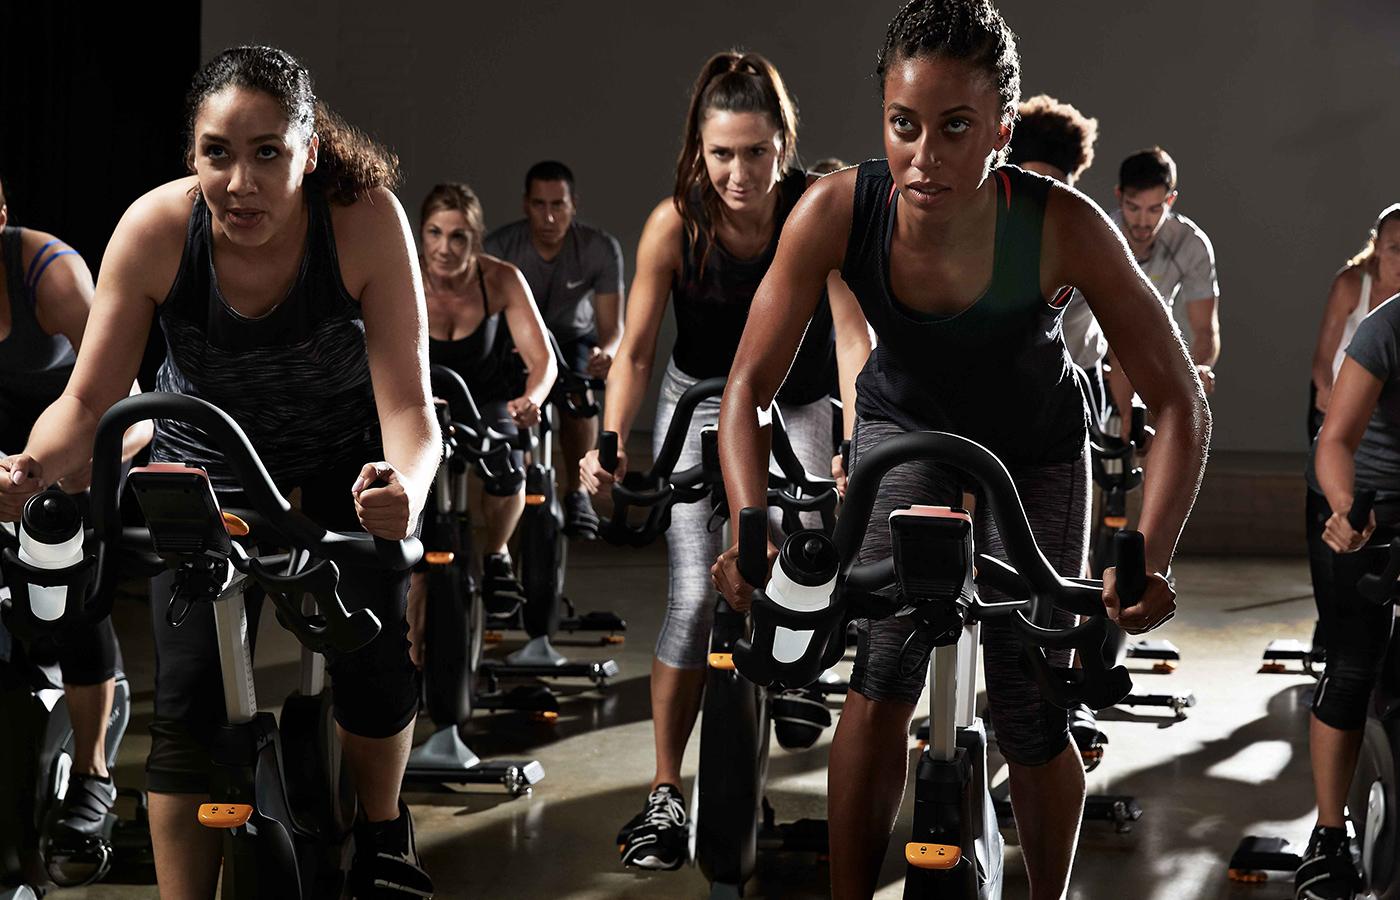 indoor cycling, spinning, matrix, bici stazionaria, pedala immerso nella musica, wellness evolution, imperia